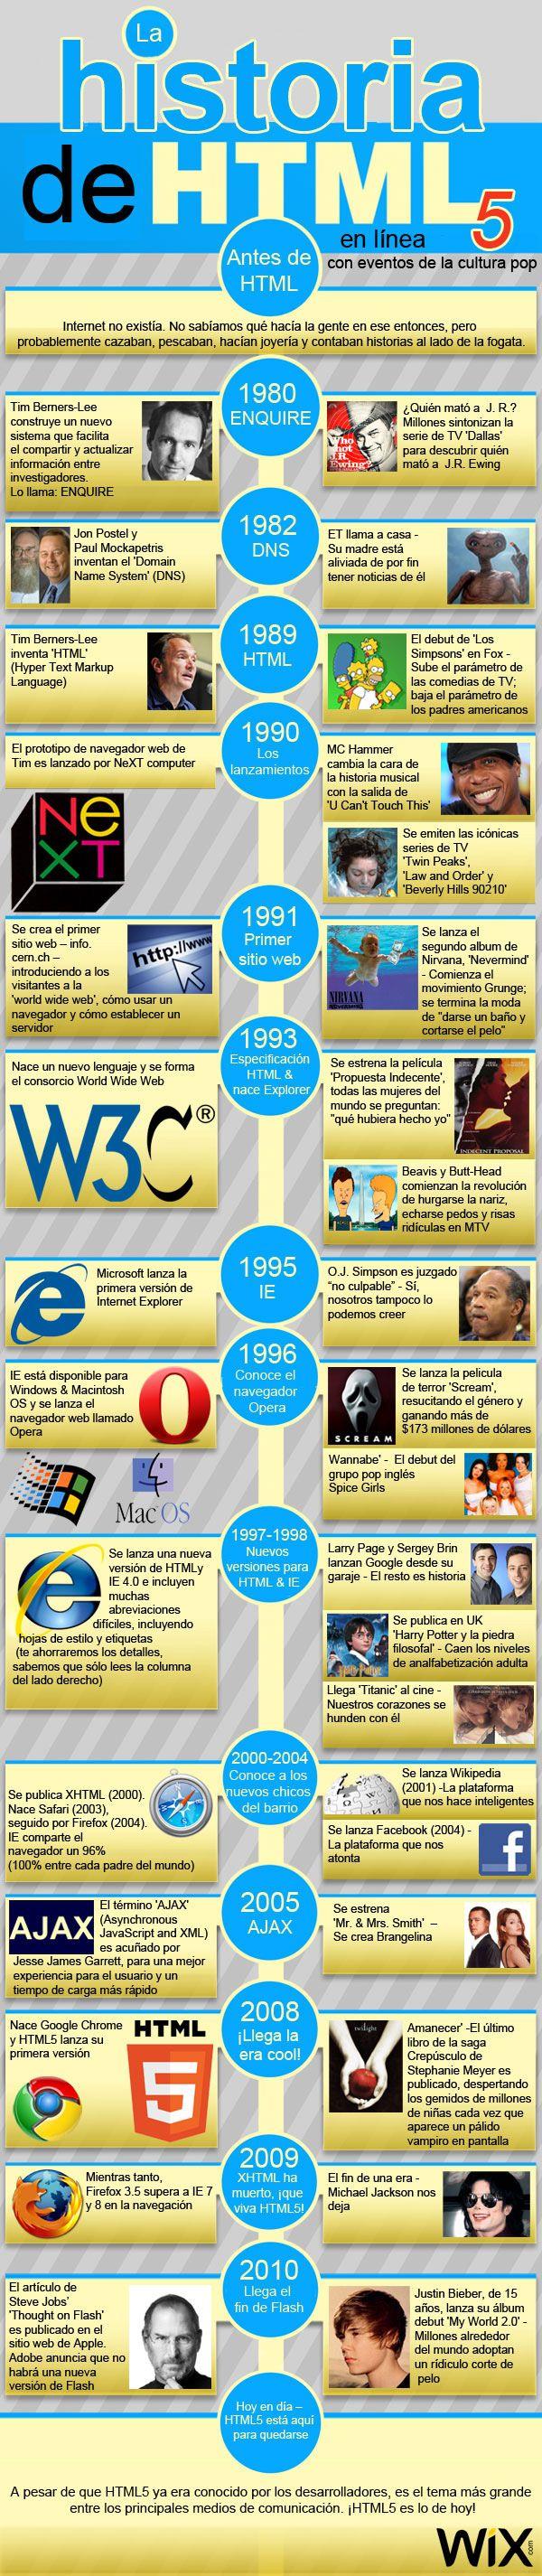 La historia del HTML5.